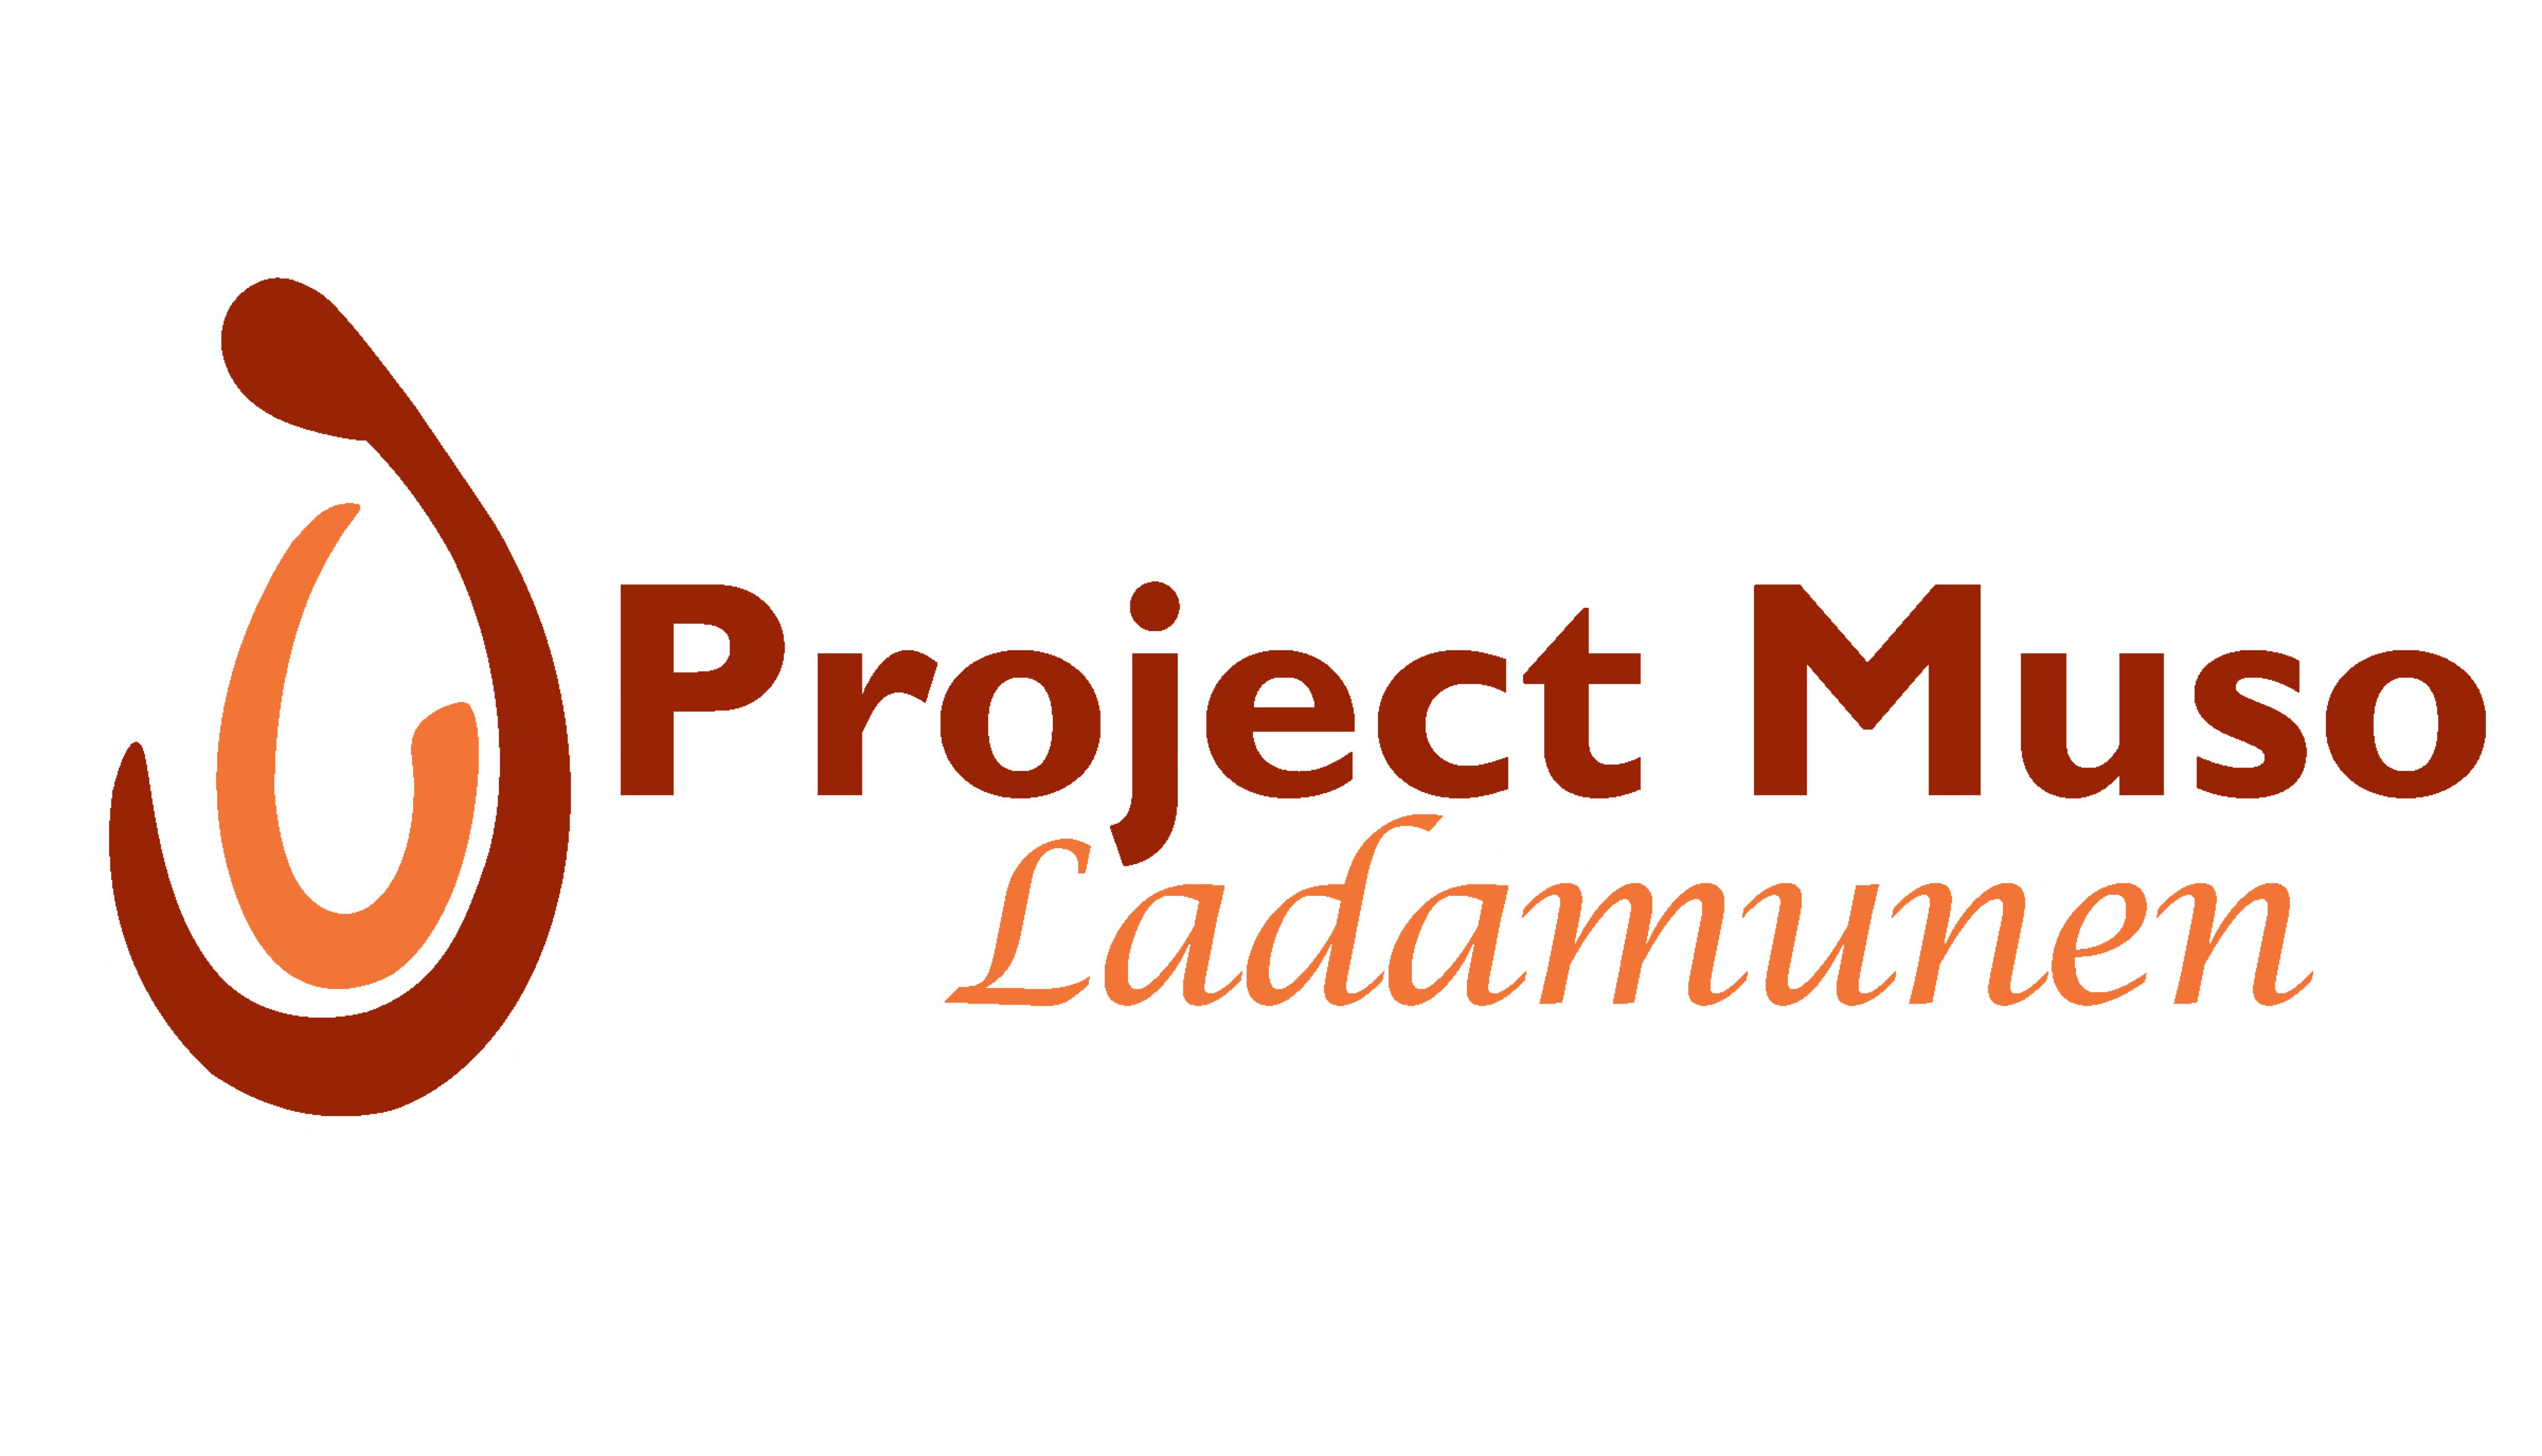 Project muso logo